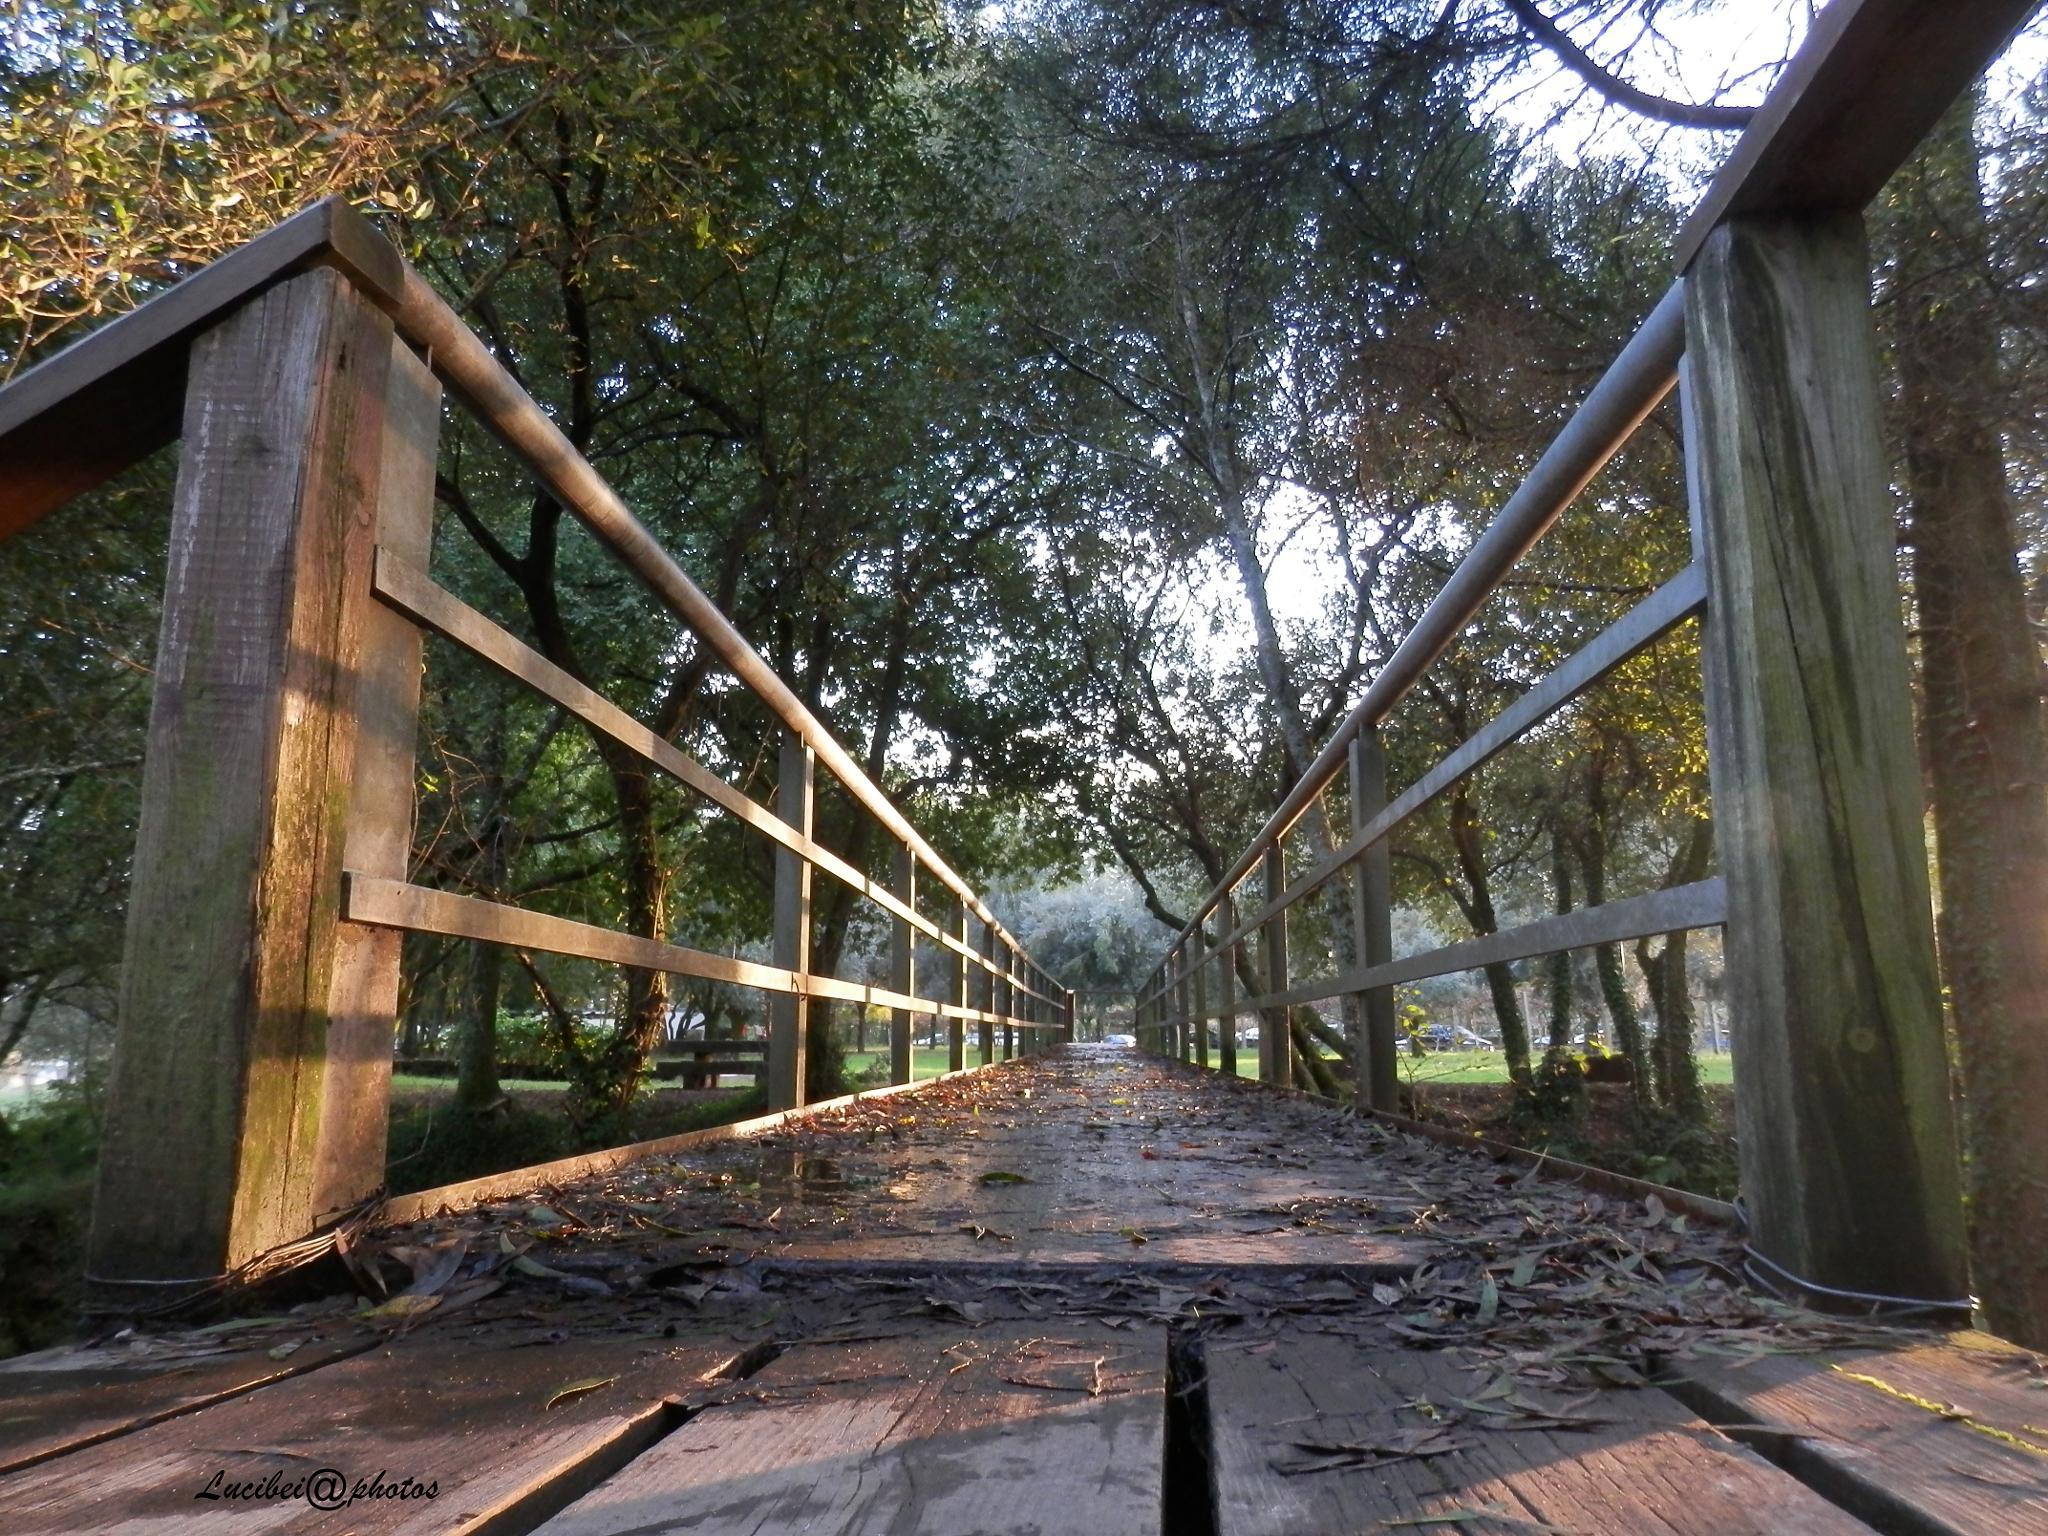 The bridge by lucia.ribeiro.33